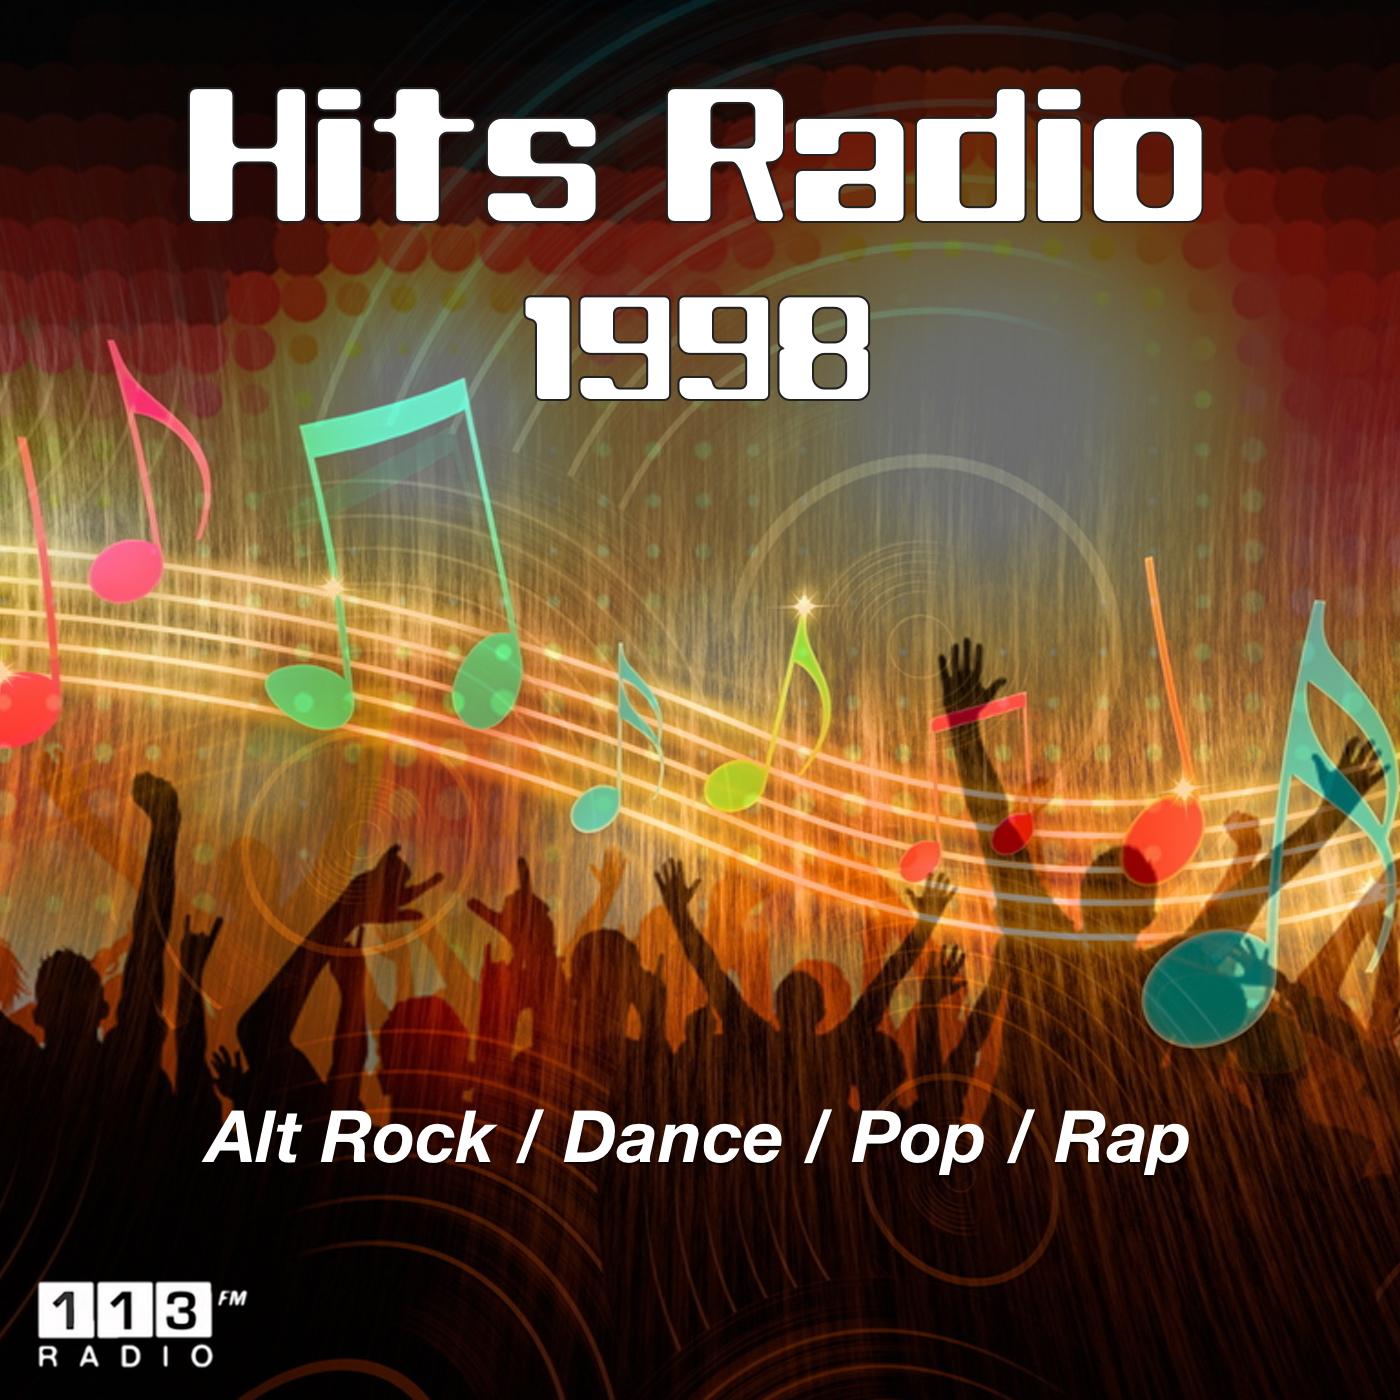 113.fm Hits Radio - 1998